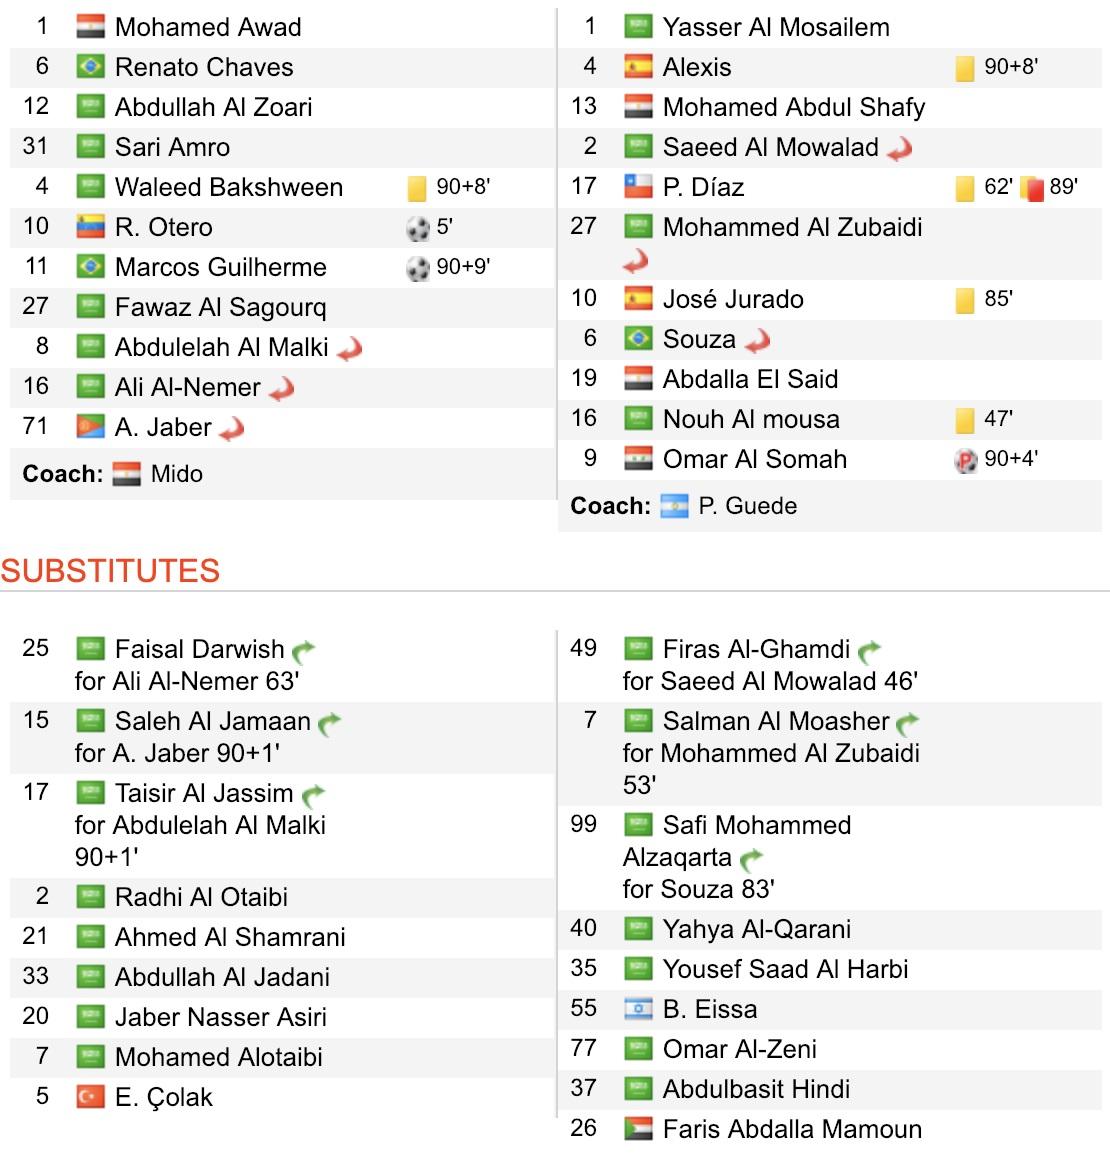 An Israeli in a Saudi team?! How can it be? B.Eissa, no. 55, on Al-Ahli's bench against Al-Wehda (Screenshot)